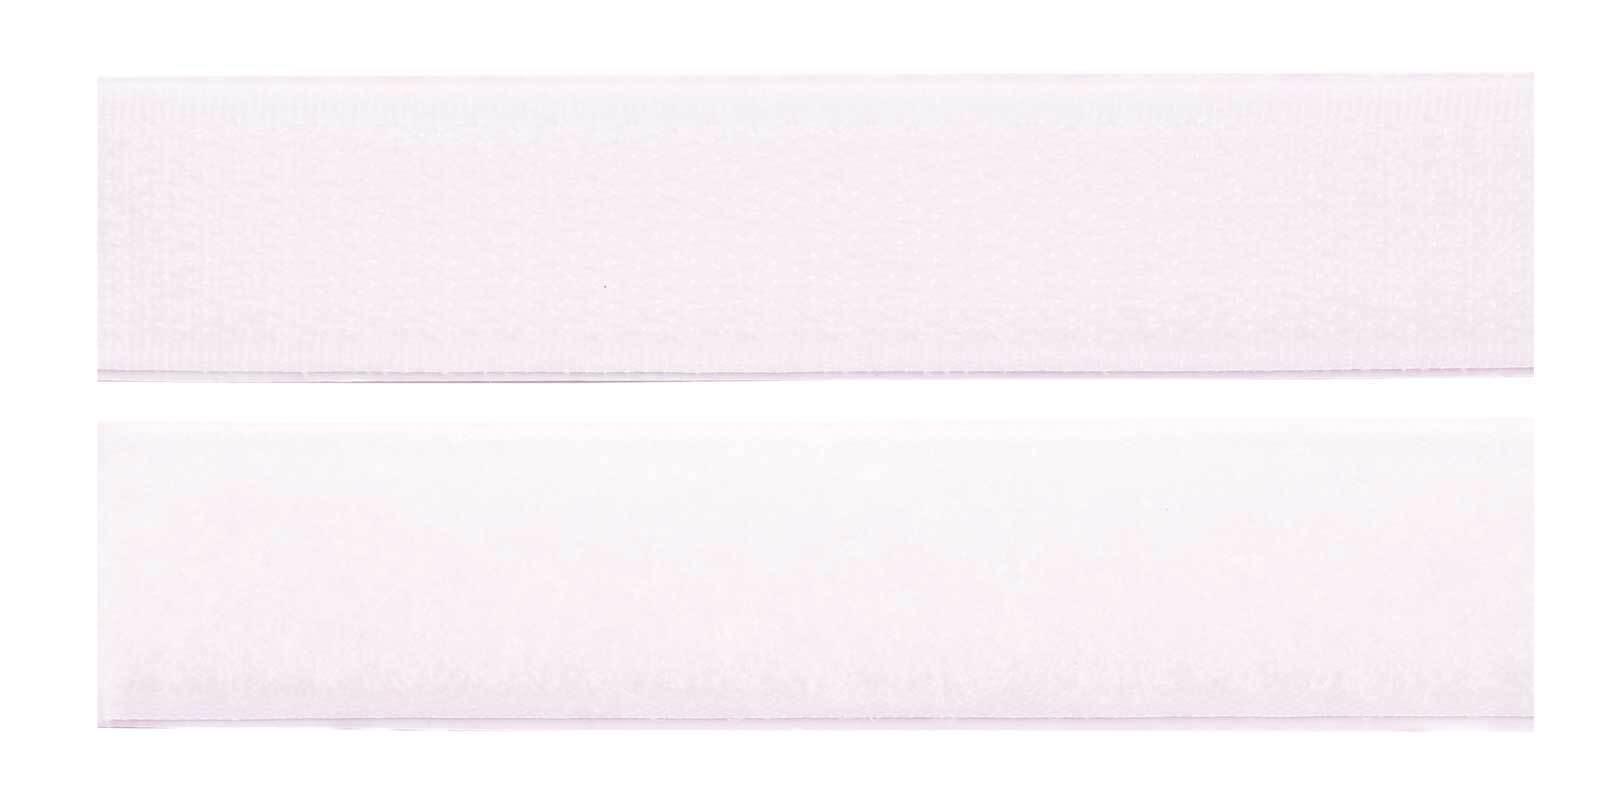 Klittenband - zelfklevend, wit